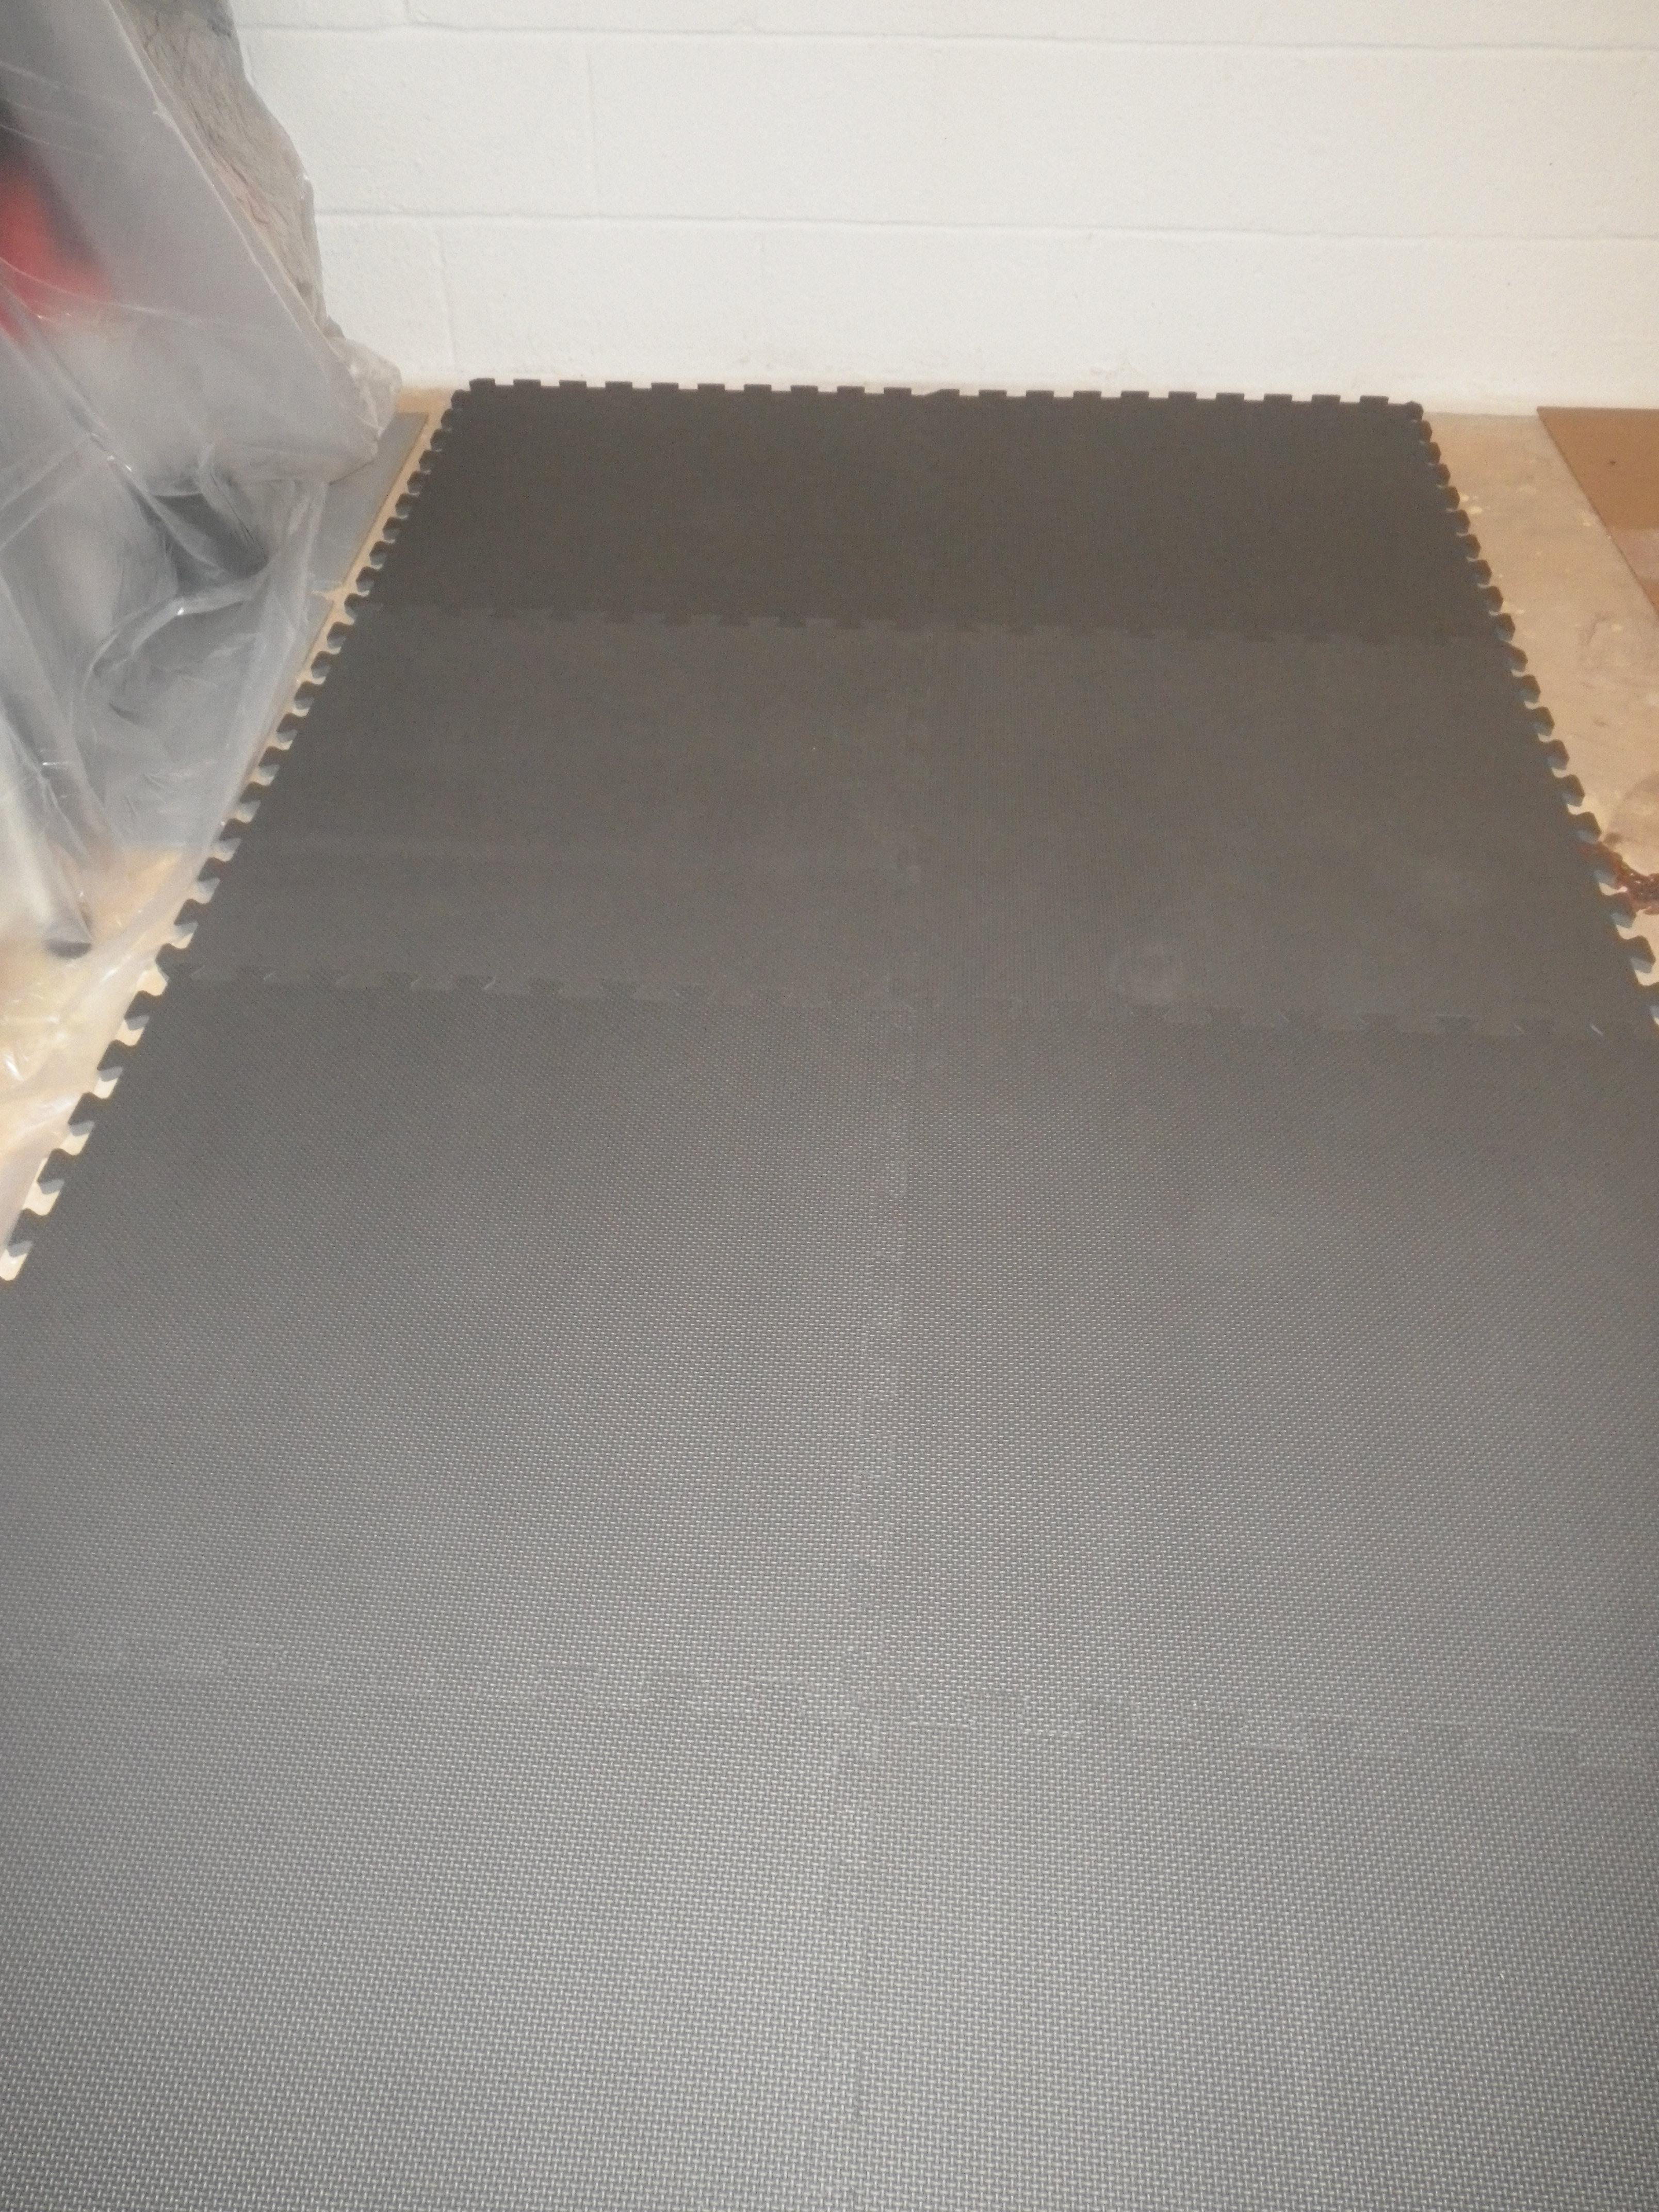 finish utility floor tiles with grain ash foam garage automotive wood puzzle cushion auto storage mats accessories mat interlocking fitness